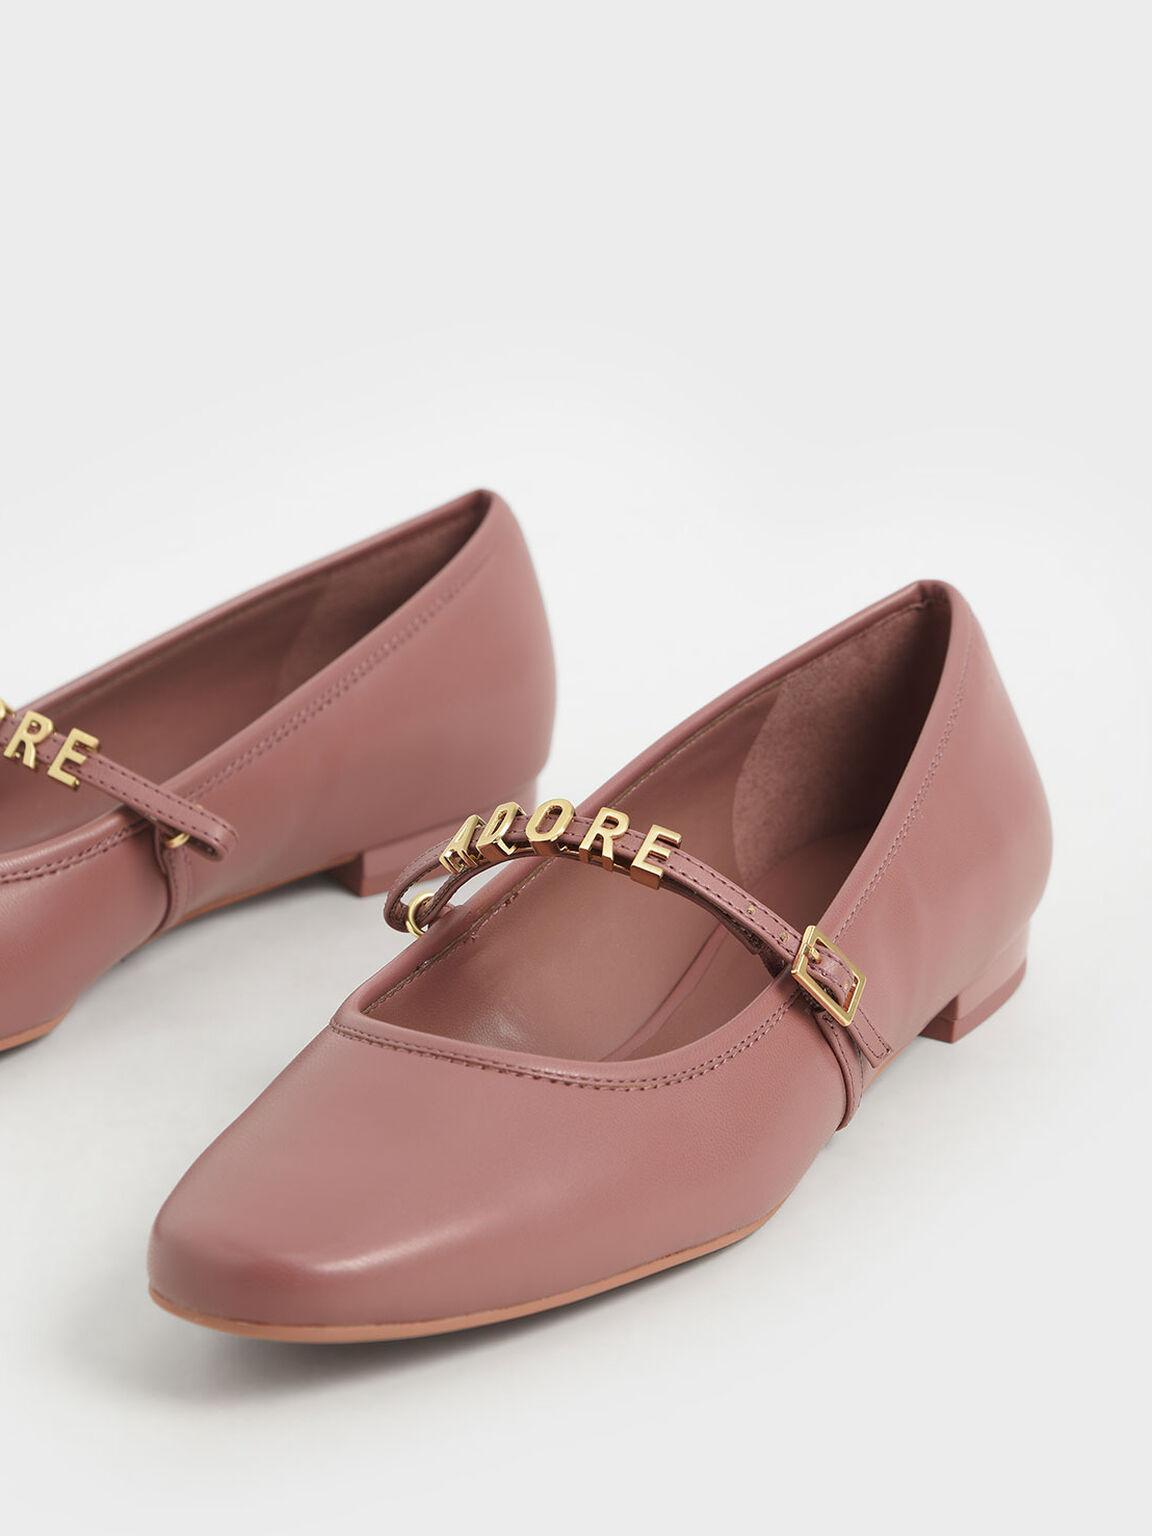 'Adore' Mary Jane Flats, Pink, hi-res